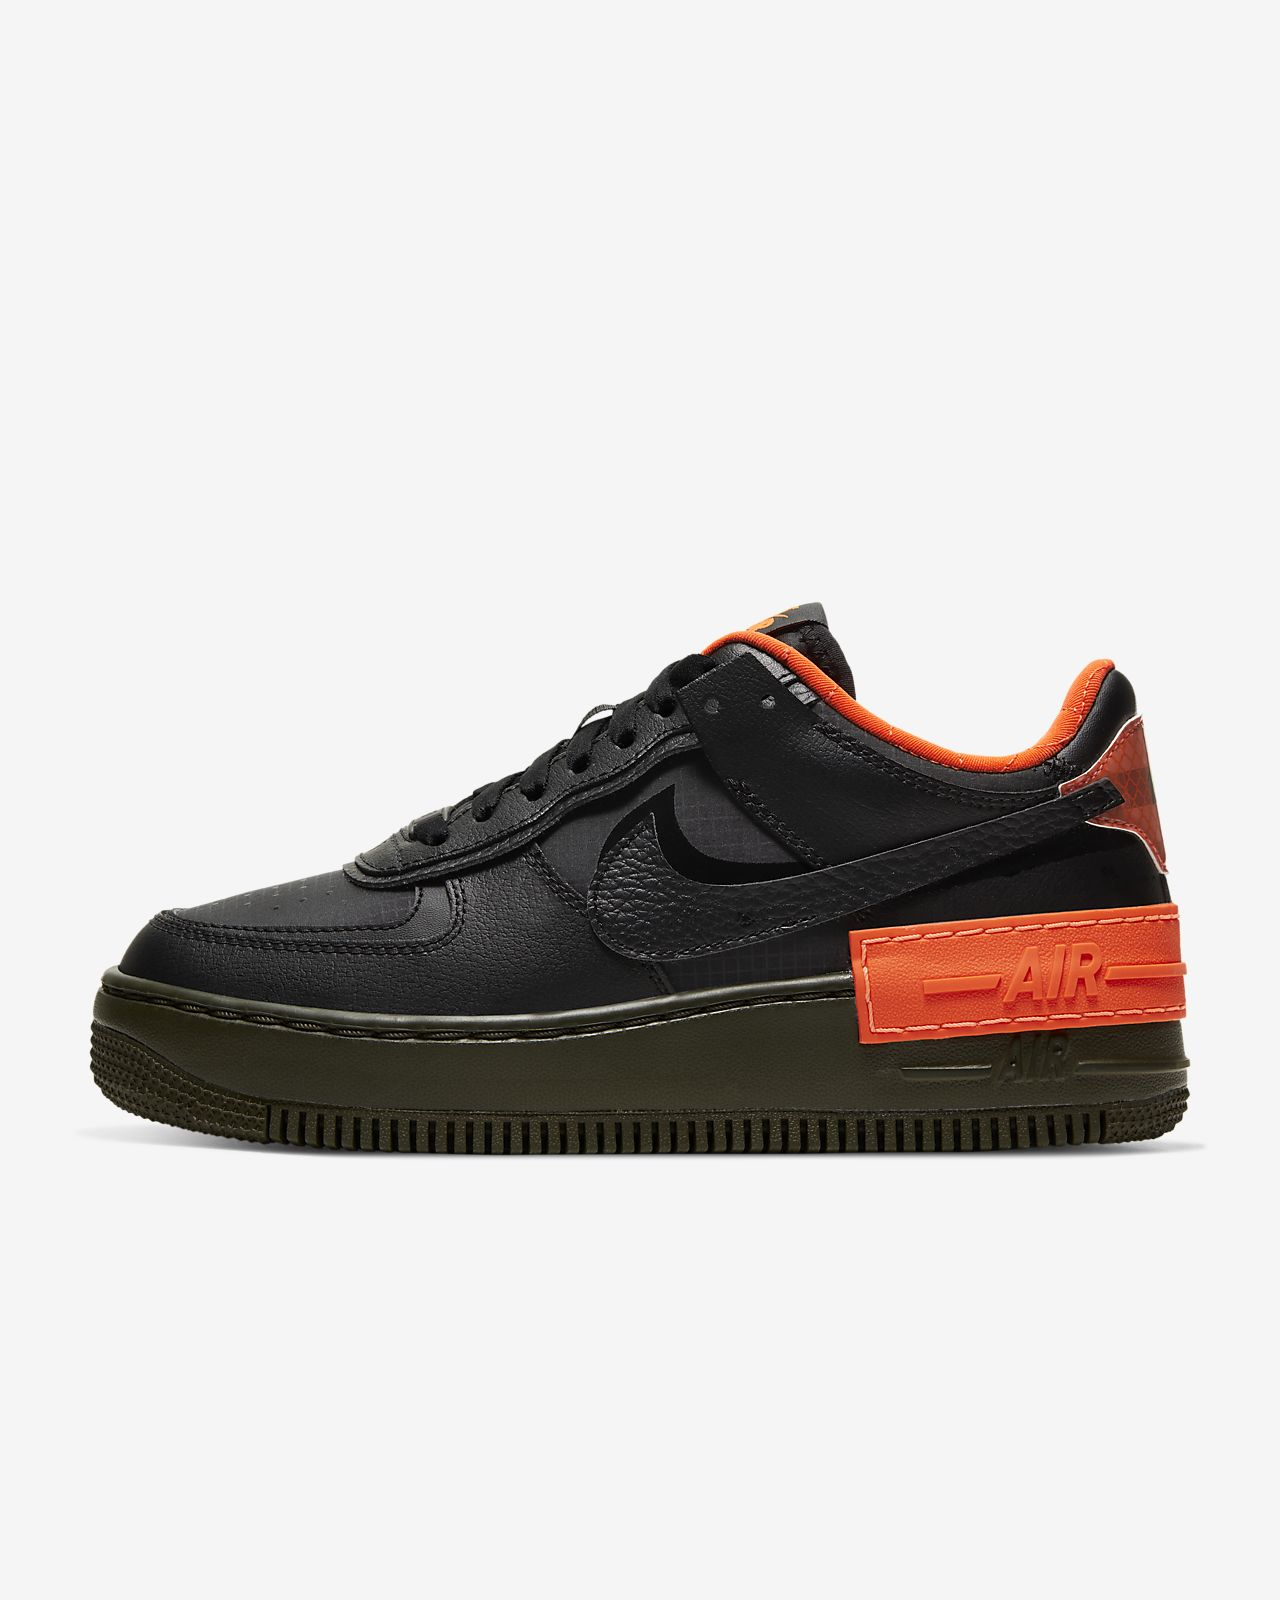 Chaussure Nike AF1 Shadow SE pour Femme